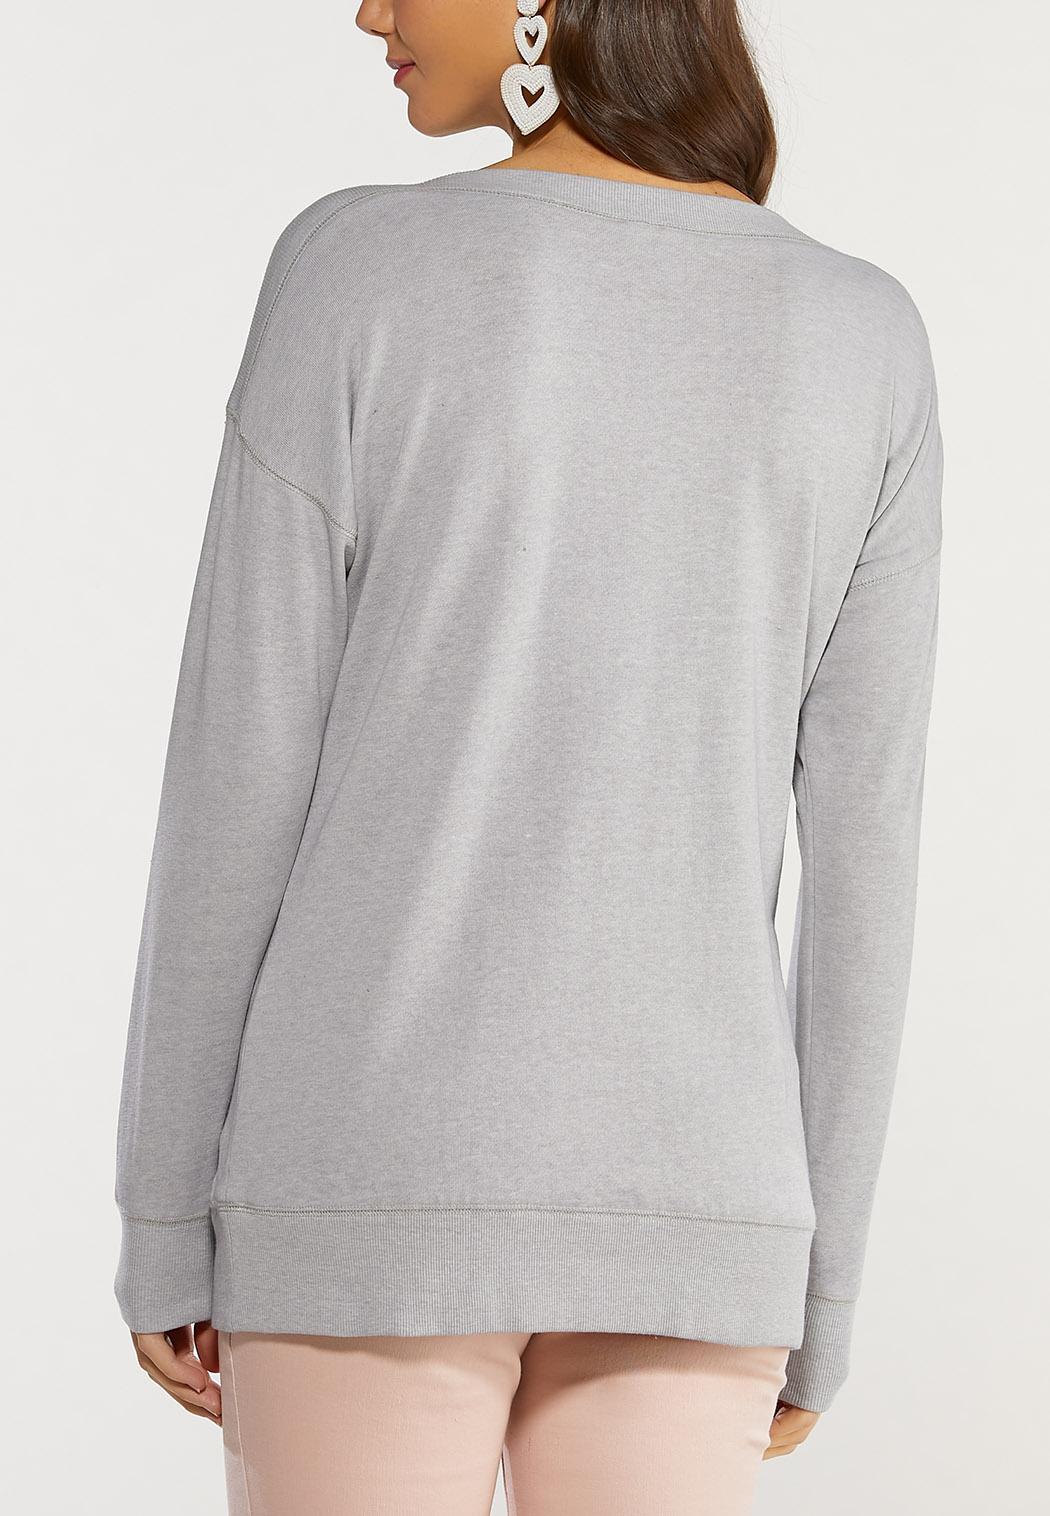 Plus Size Love Yourself Sweatshirt (Item #44501885)